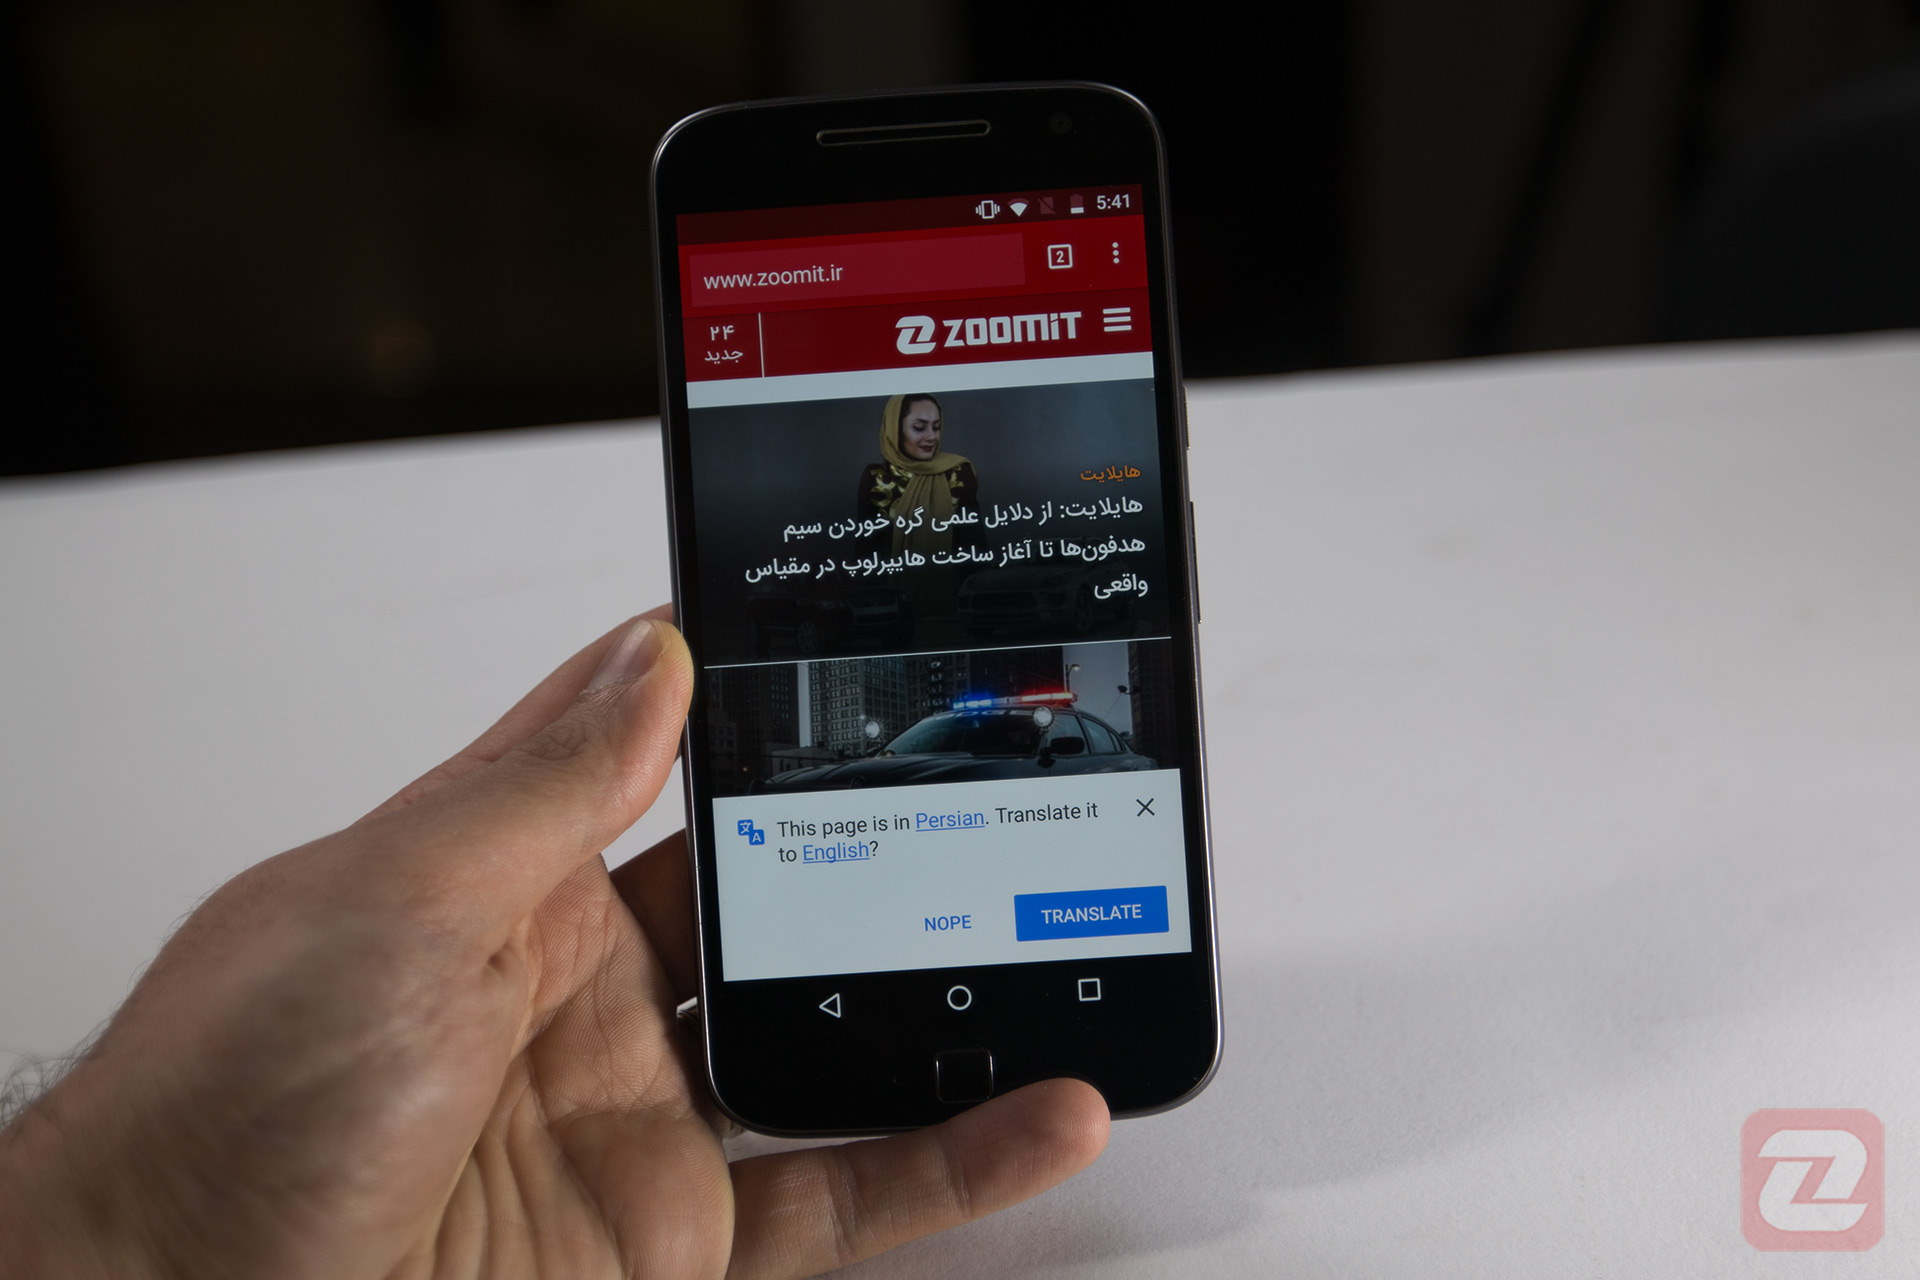 Moto G4 Plus - Display